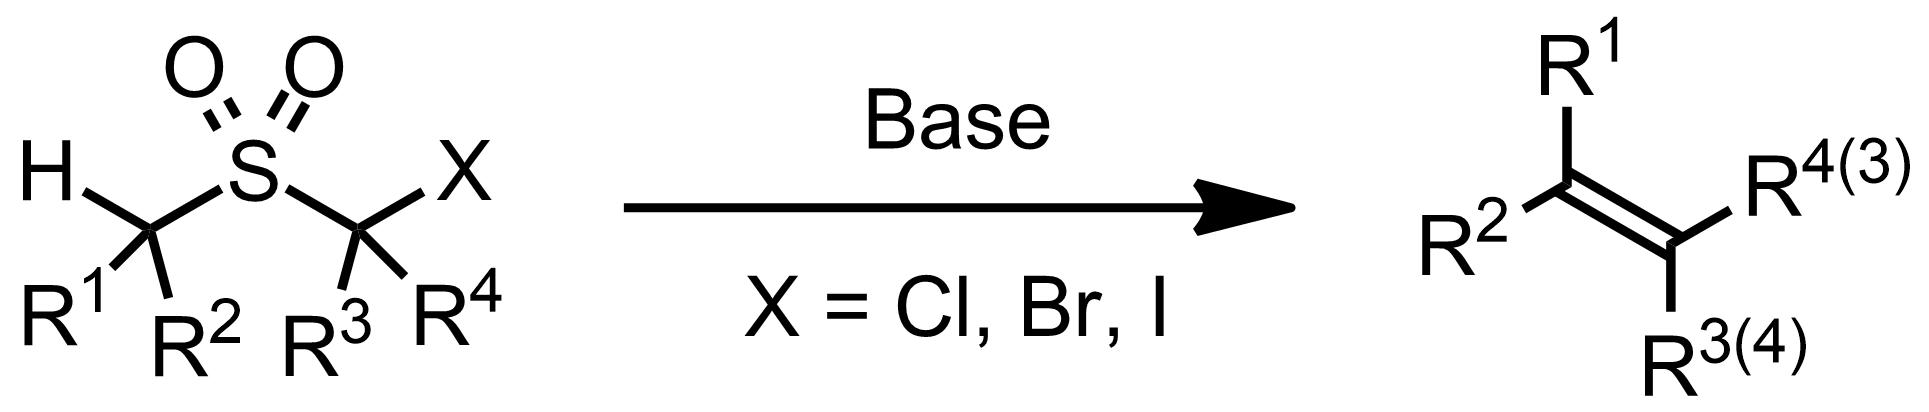 Schematic representation of the Ramberg-Bäcklund Reaction.